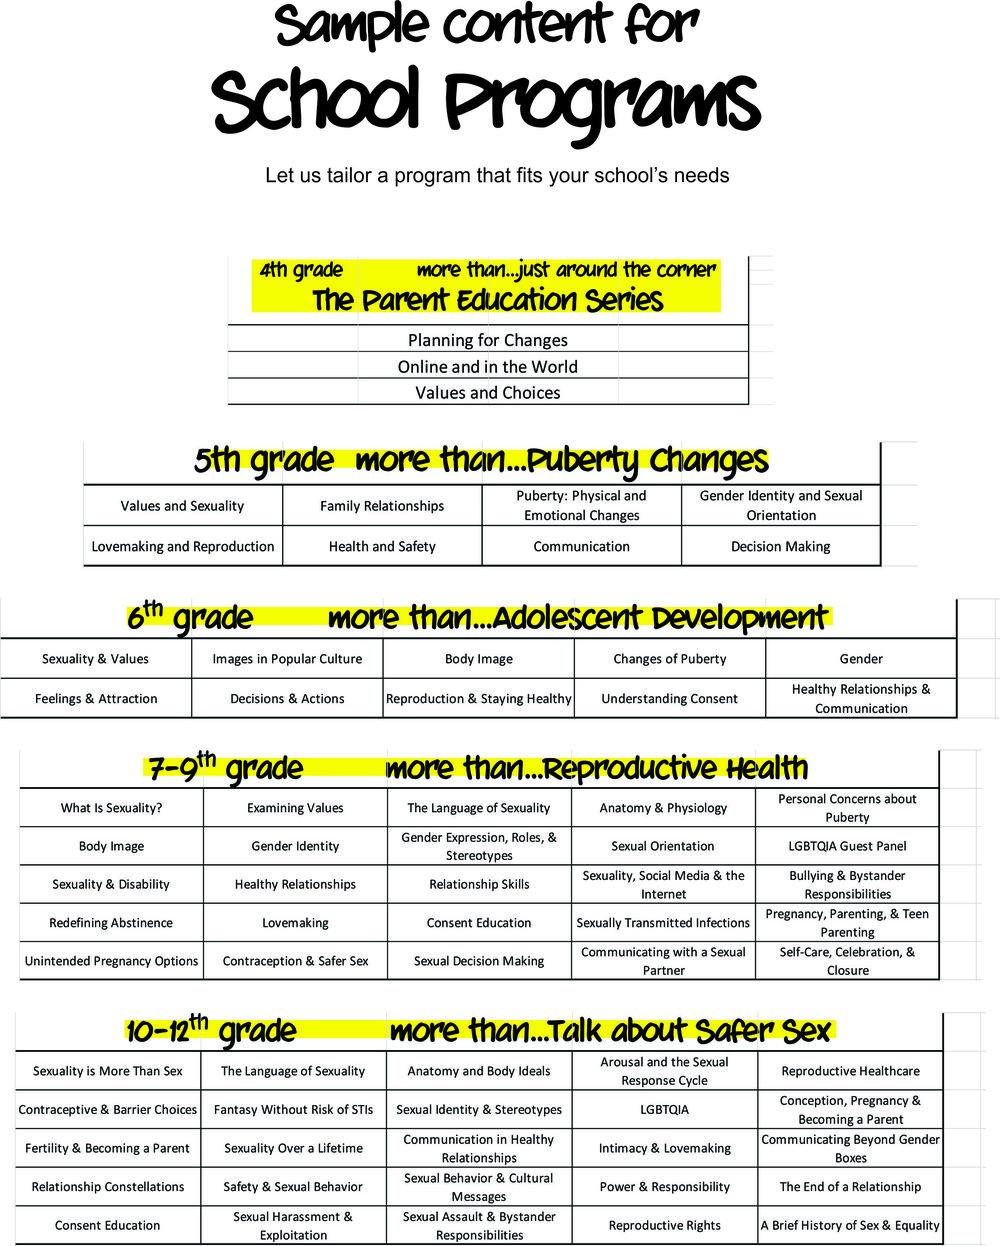 20171114 MTSE school topics 4 charts.jpg